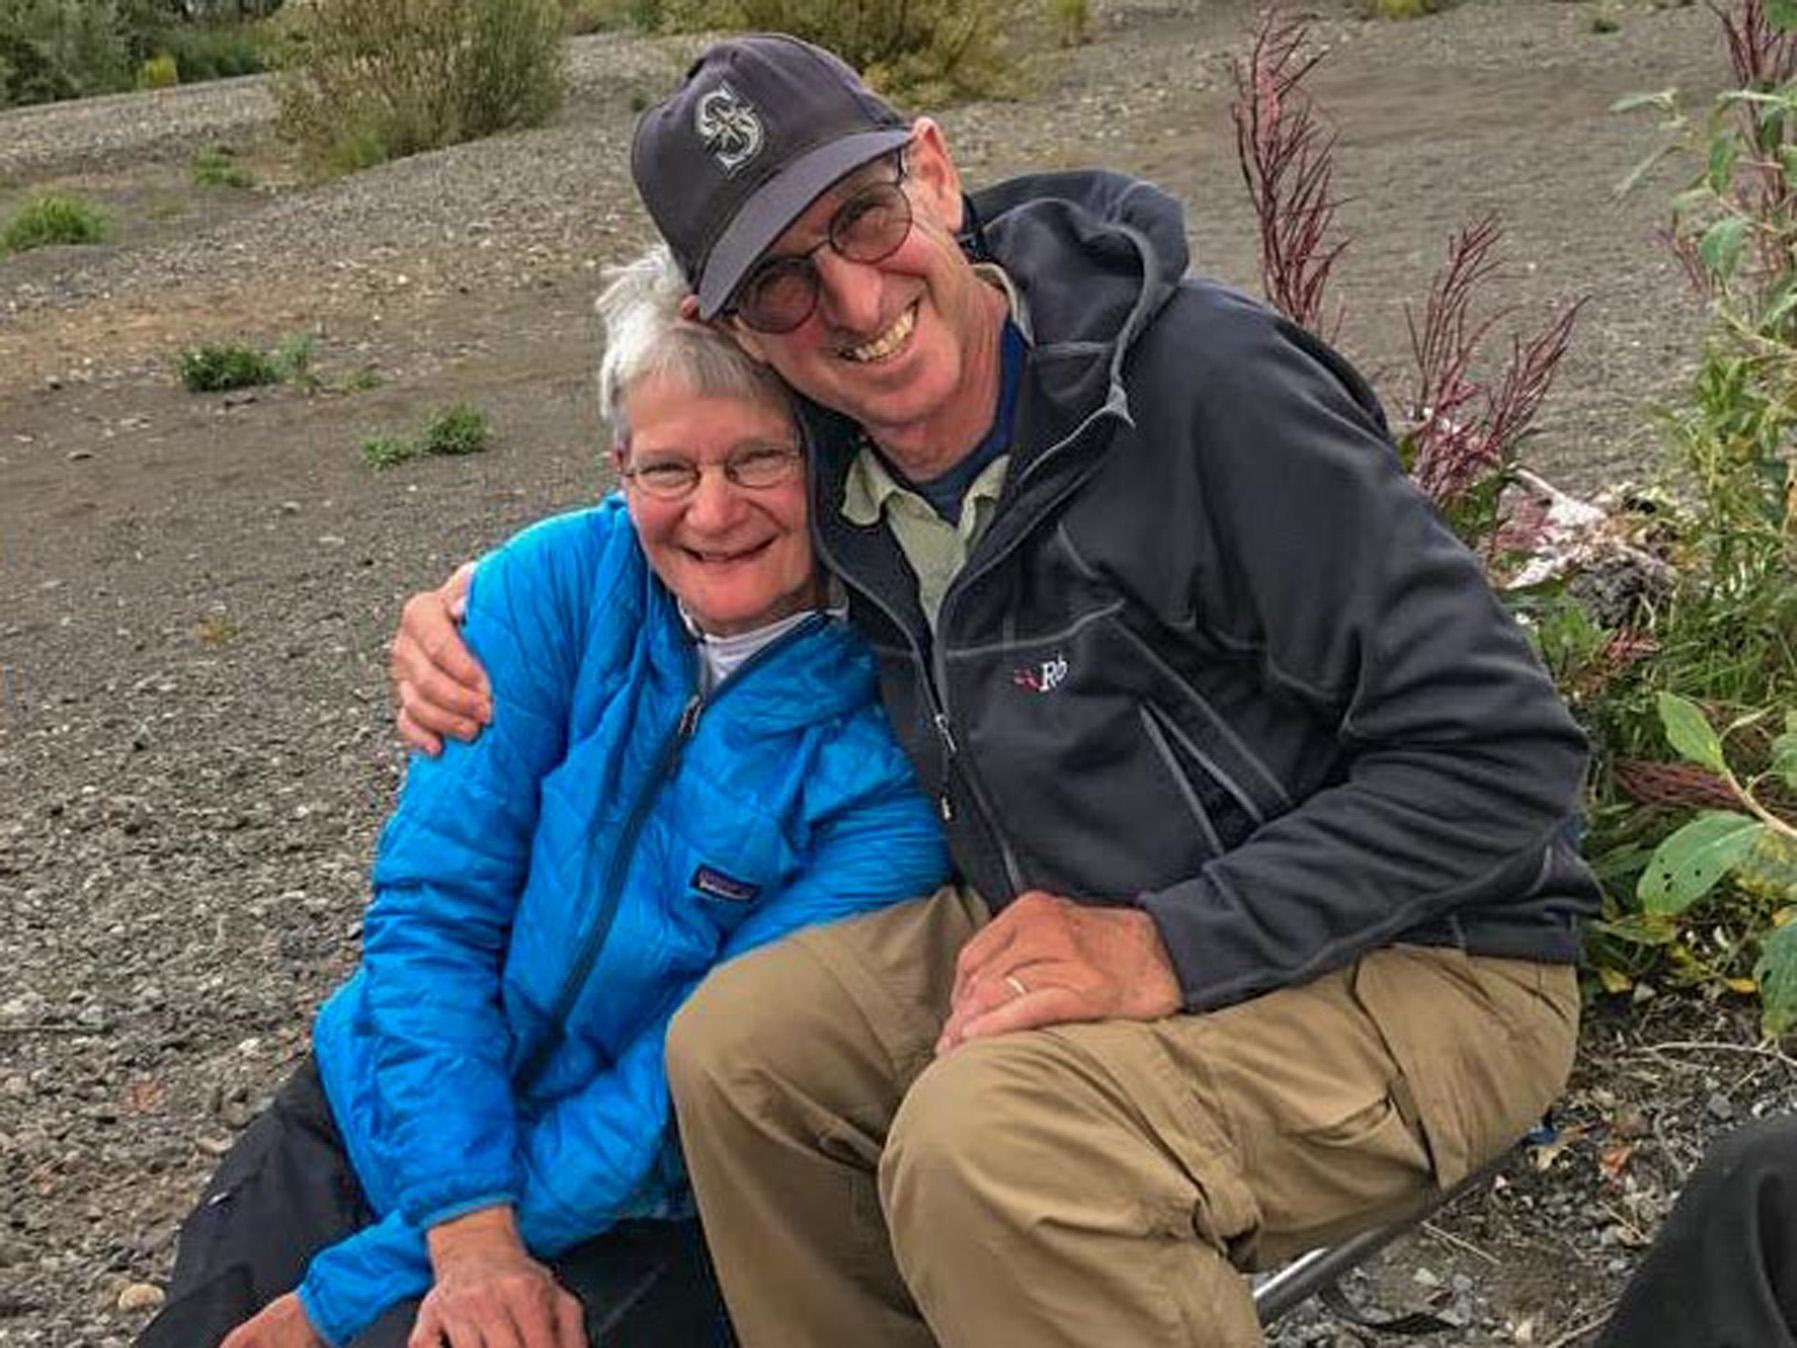 Tom & Judy hug portrait